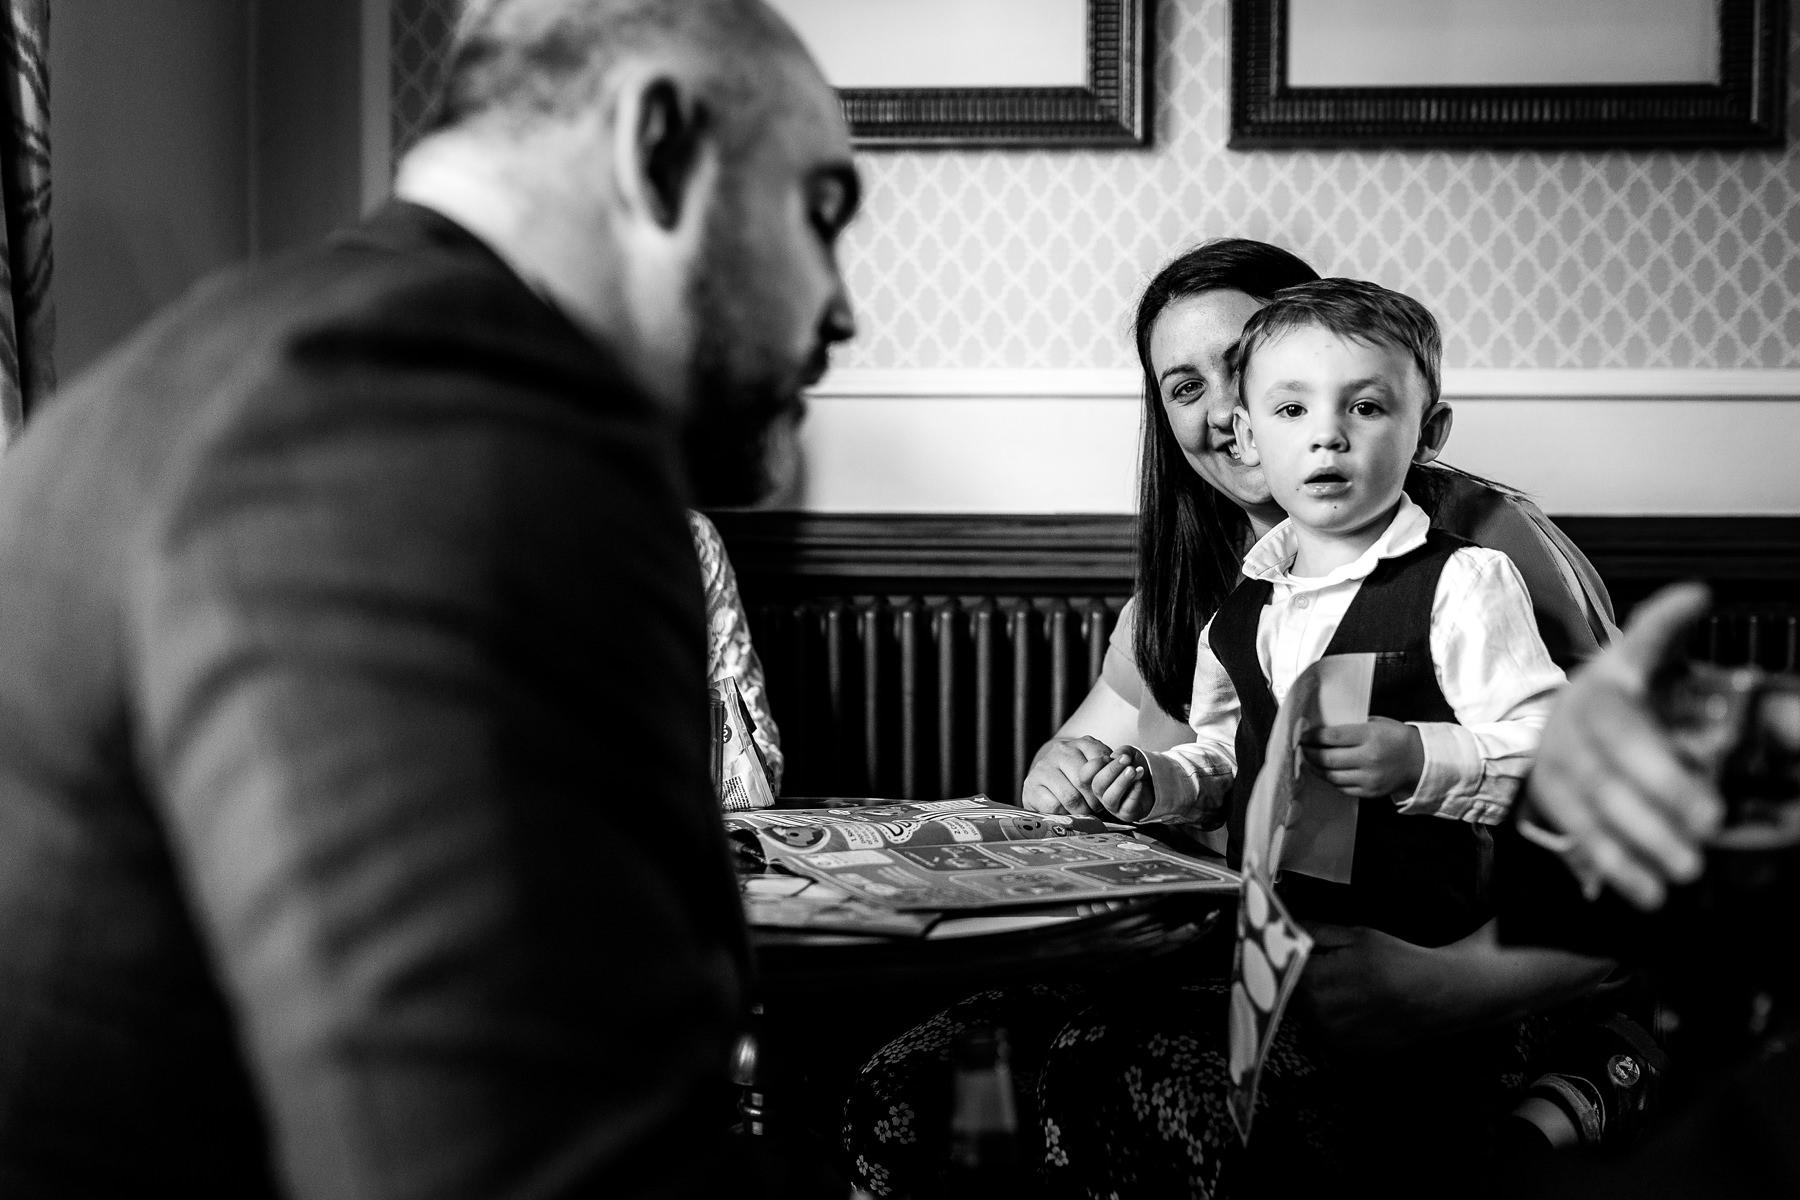 intimate-wedding-at-kilhey-court-lancashire-photographer_0022.jpg